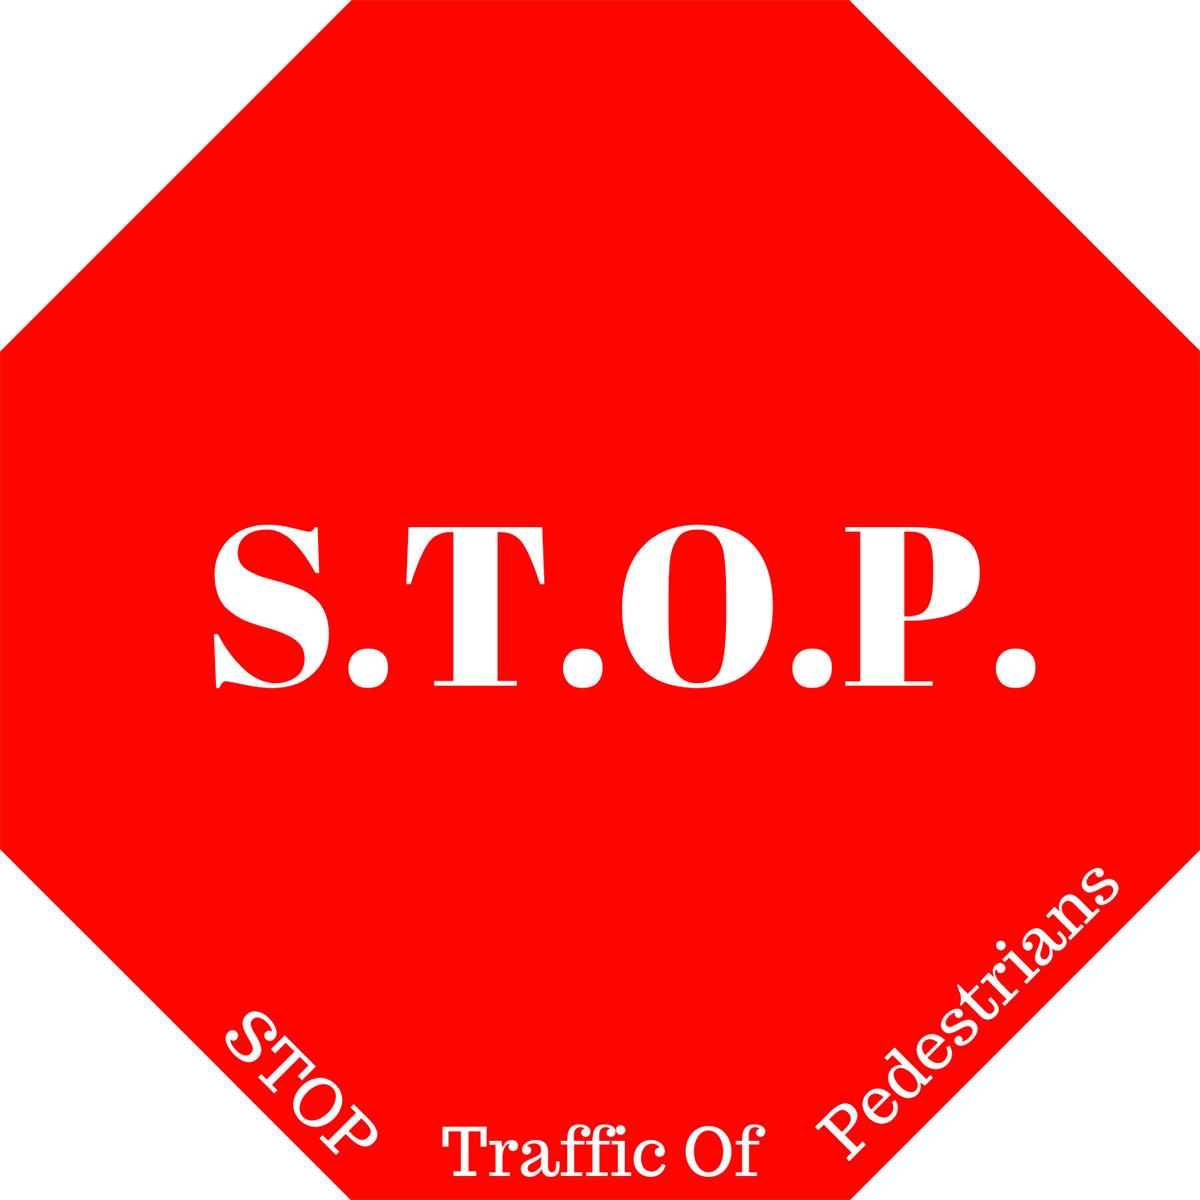 STOP (Stop Traffic Of Pedestrians Logo